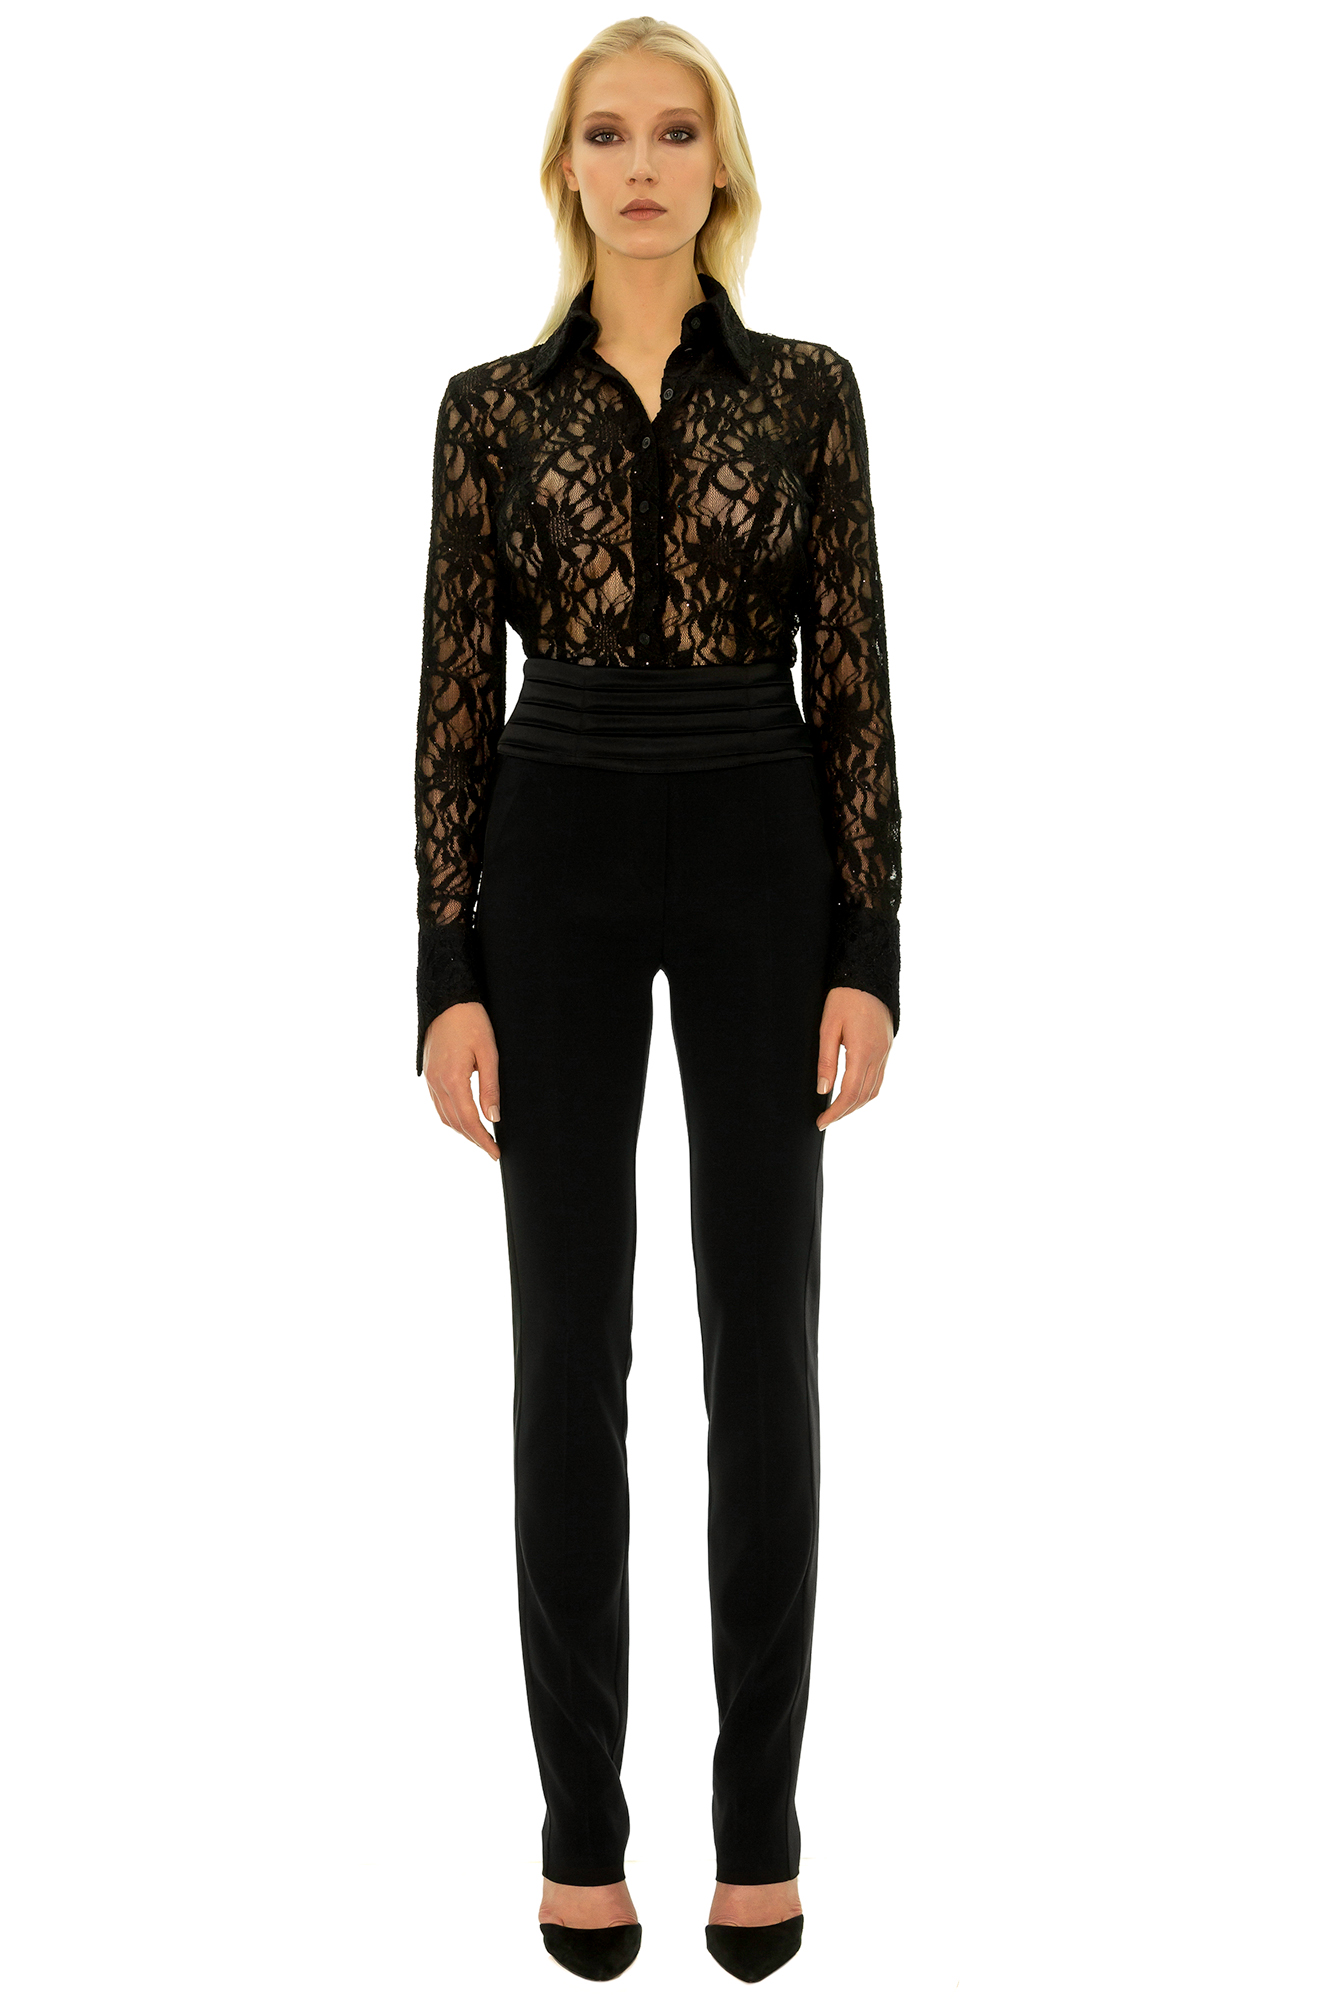 pantalon femme taille haute chic pantalon taille haute. Black Bedroom Furniture Sets. Home Design Ideas